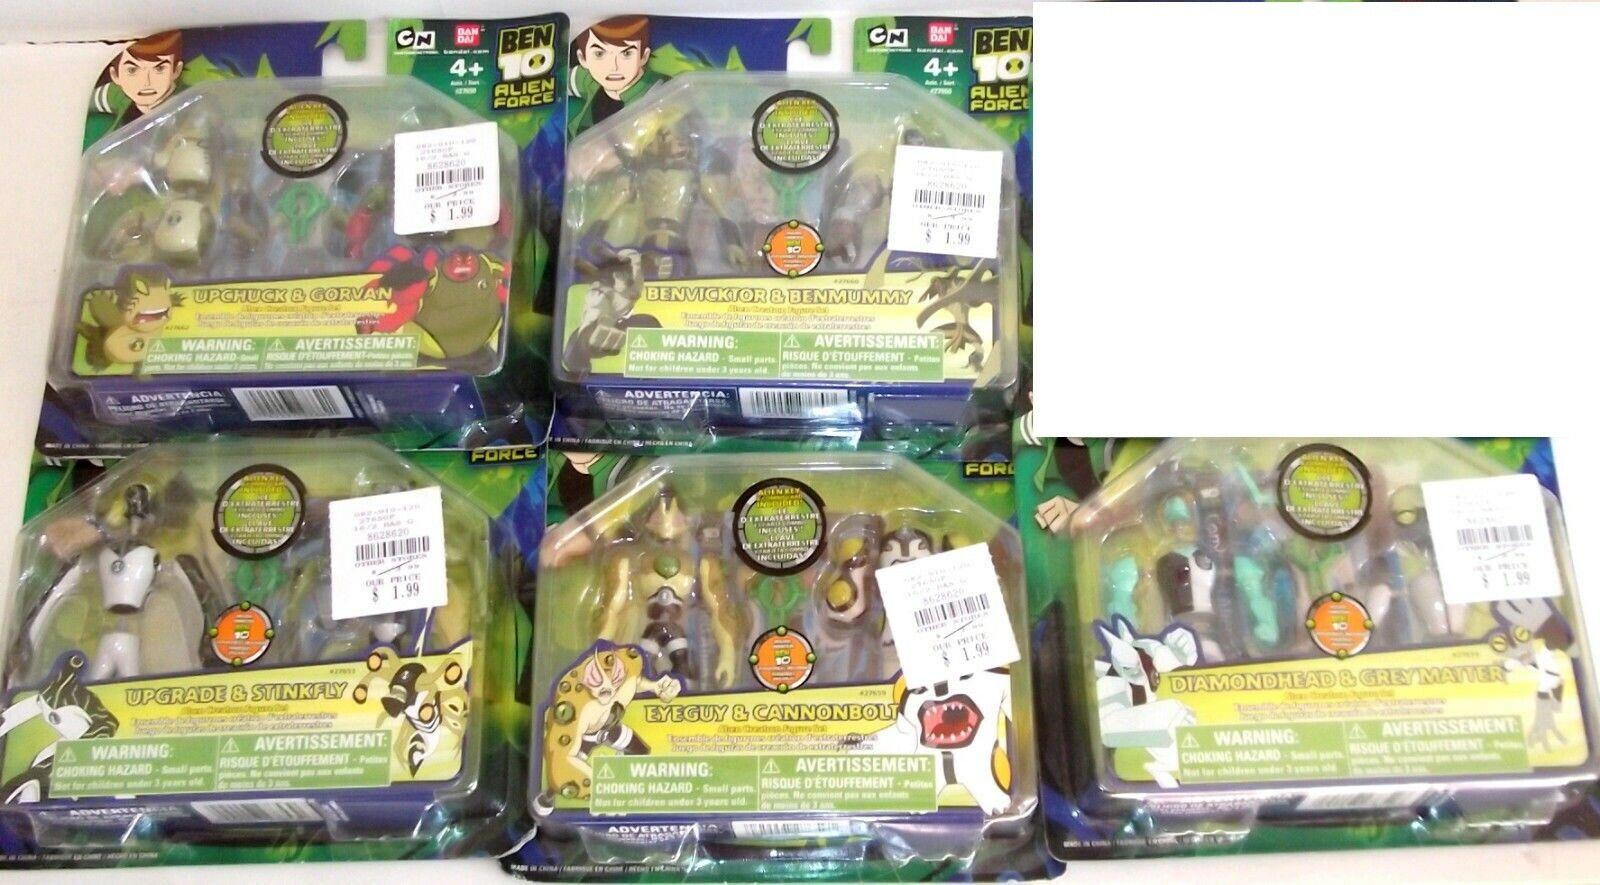 Ben 10 Action Figure Ultimate Alien Force creation 2 packs 5 LOT MOC BRAND NEW